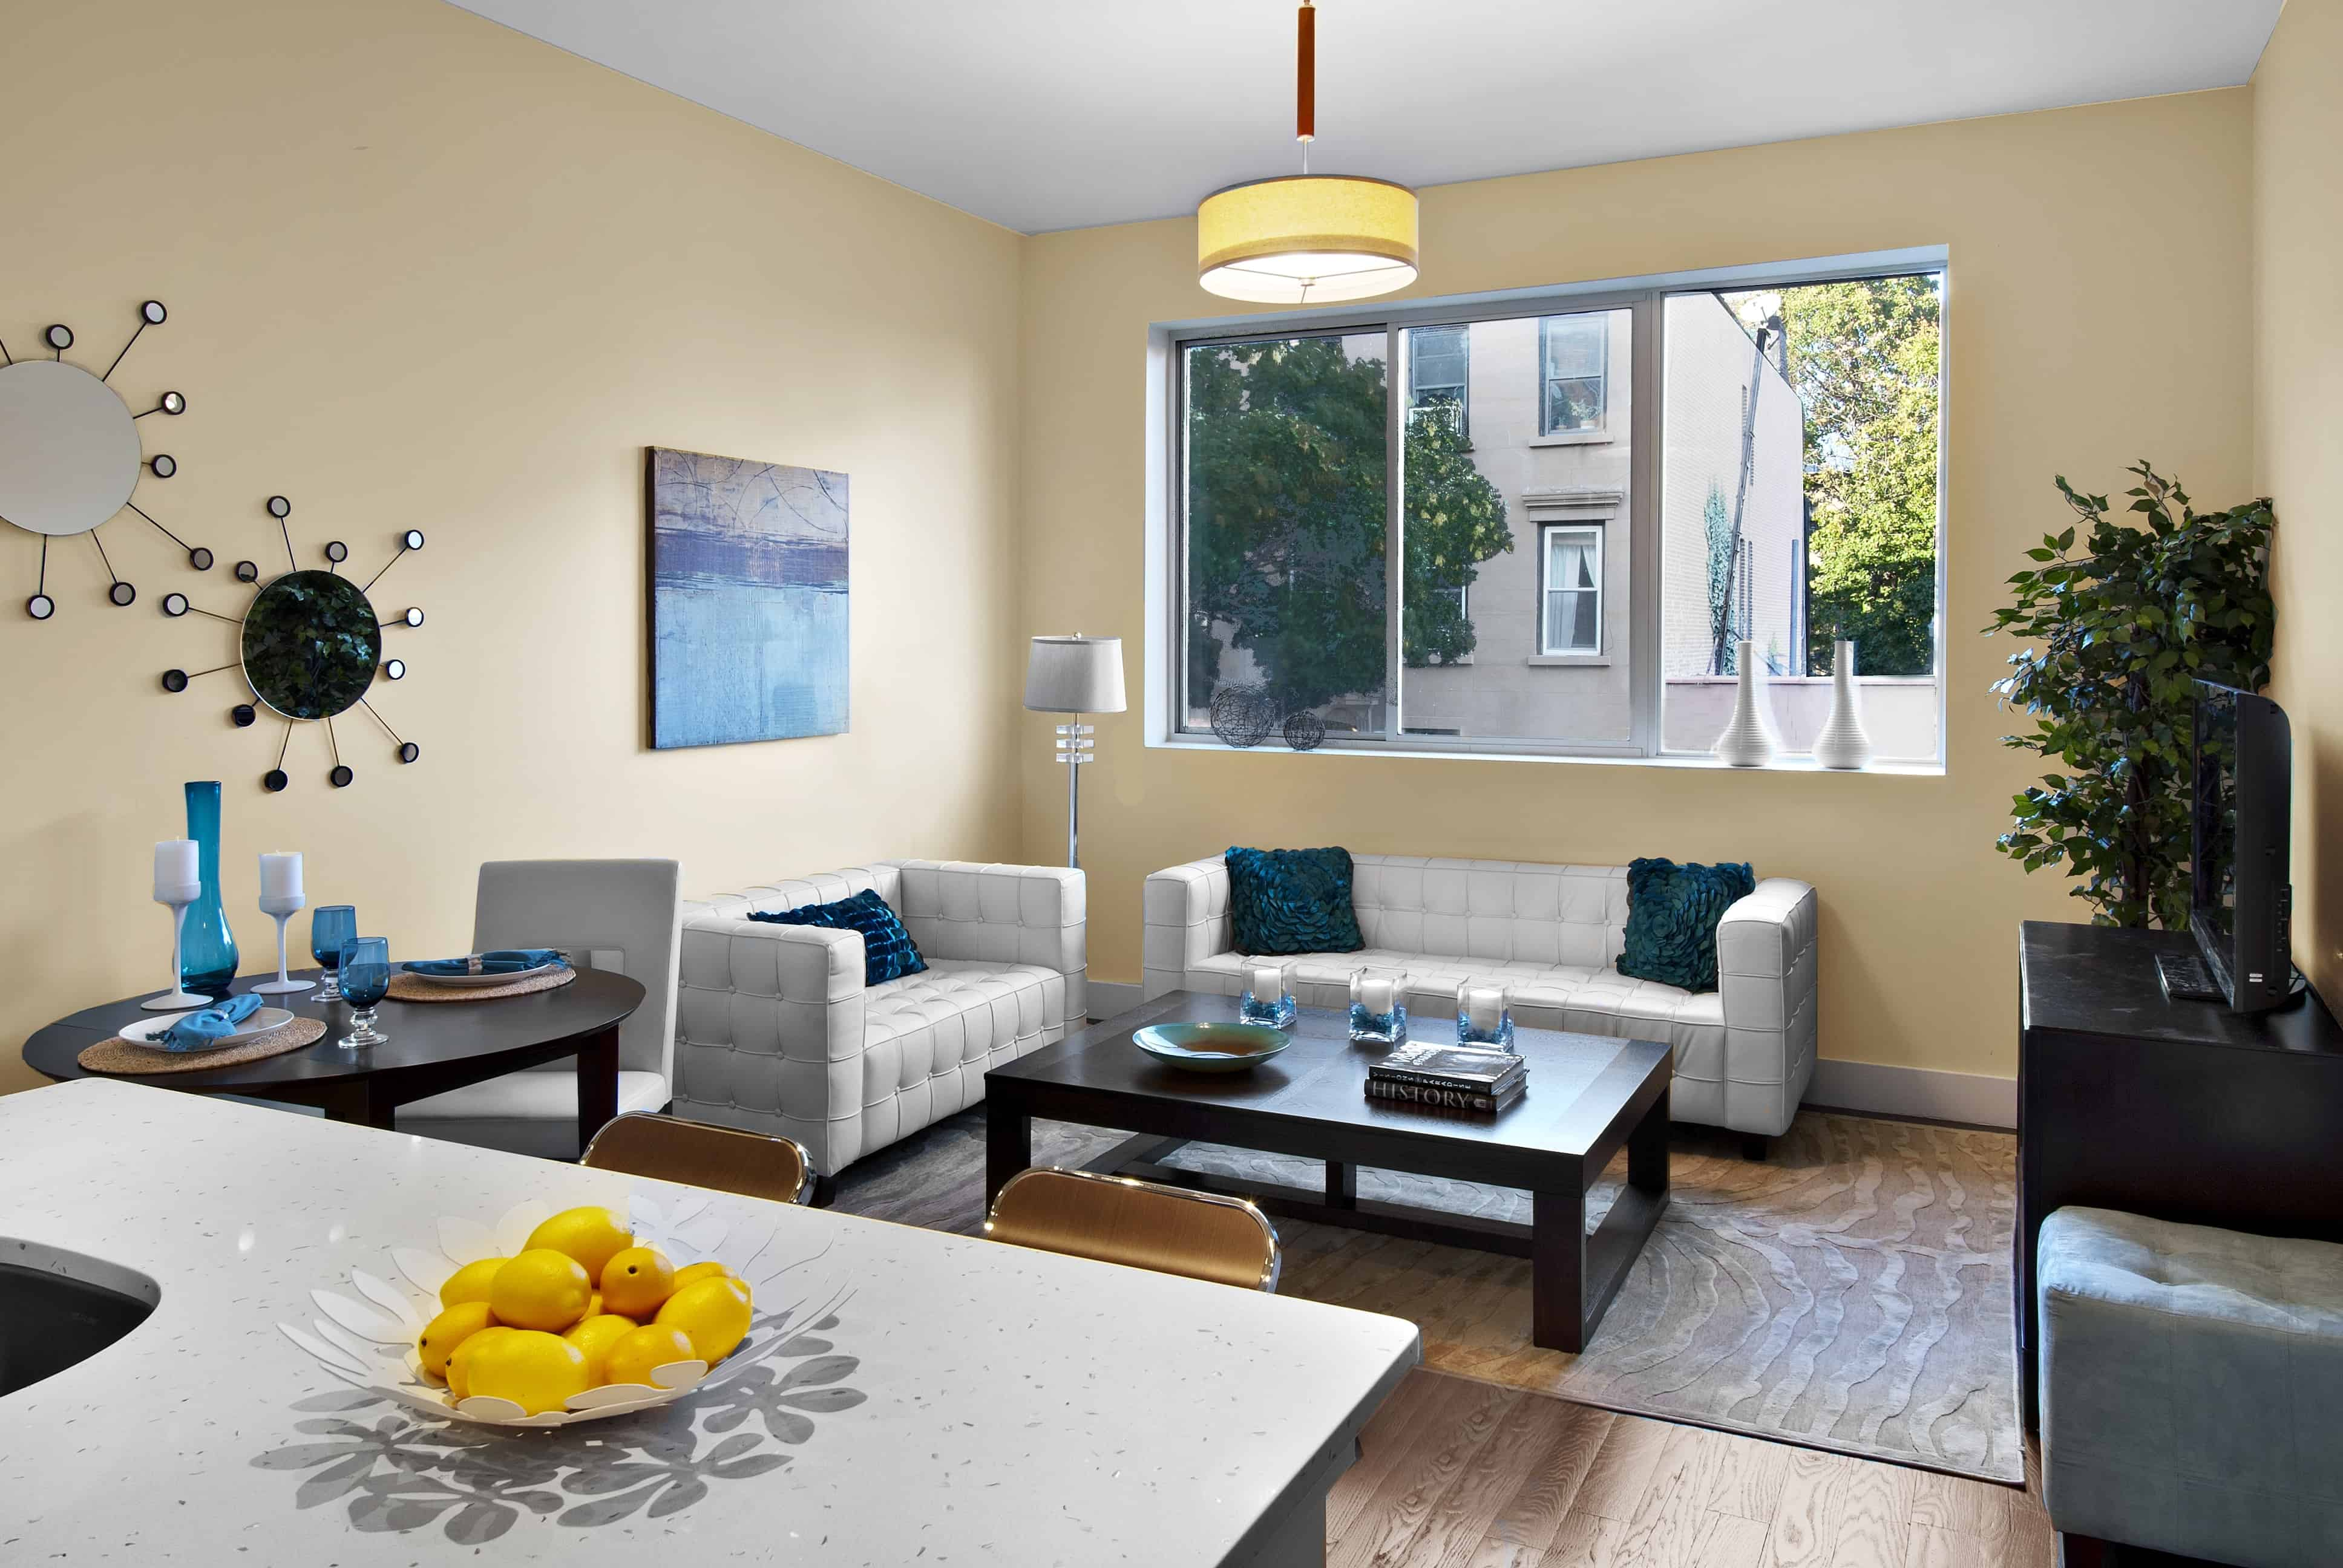 Zumper Apartment Finding Apps